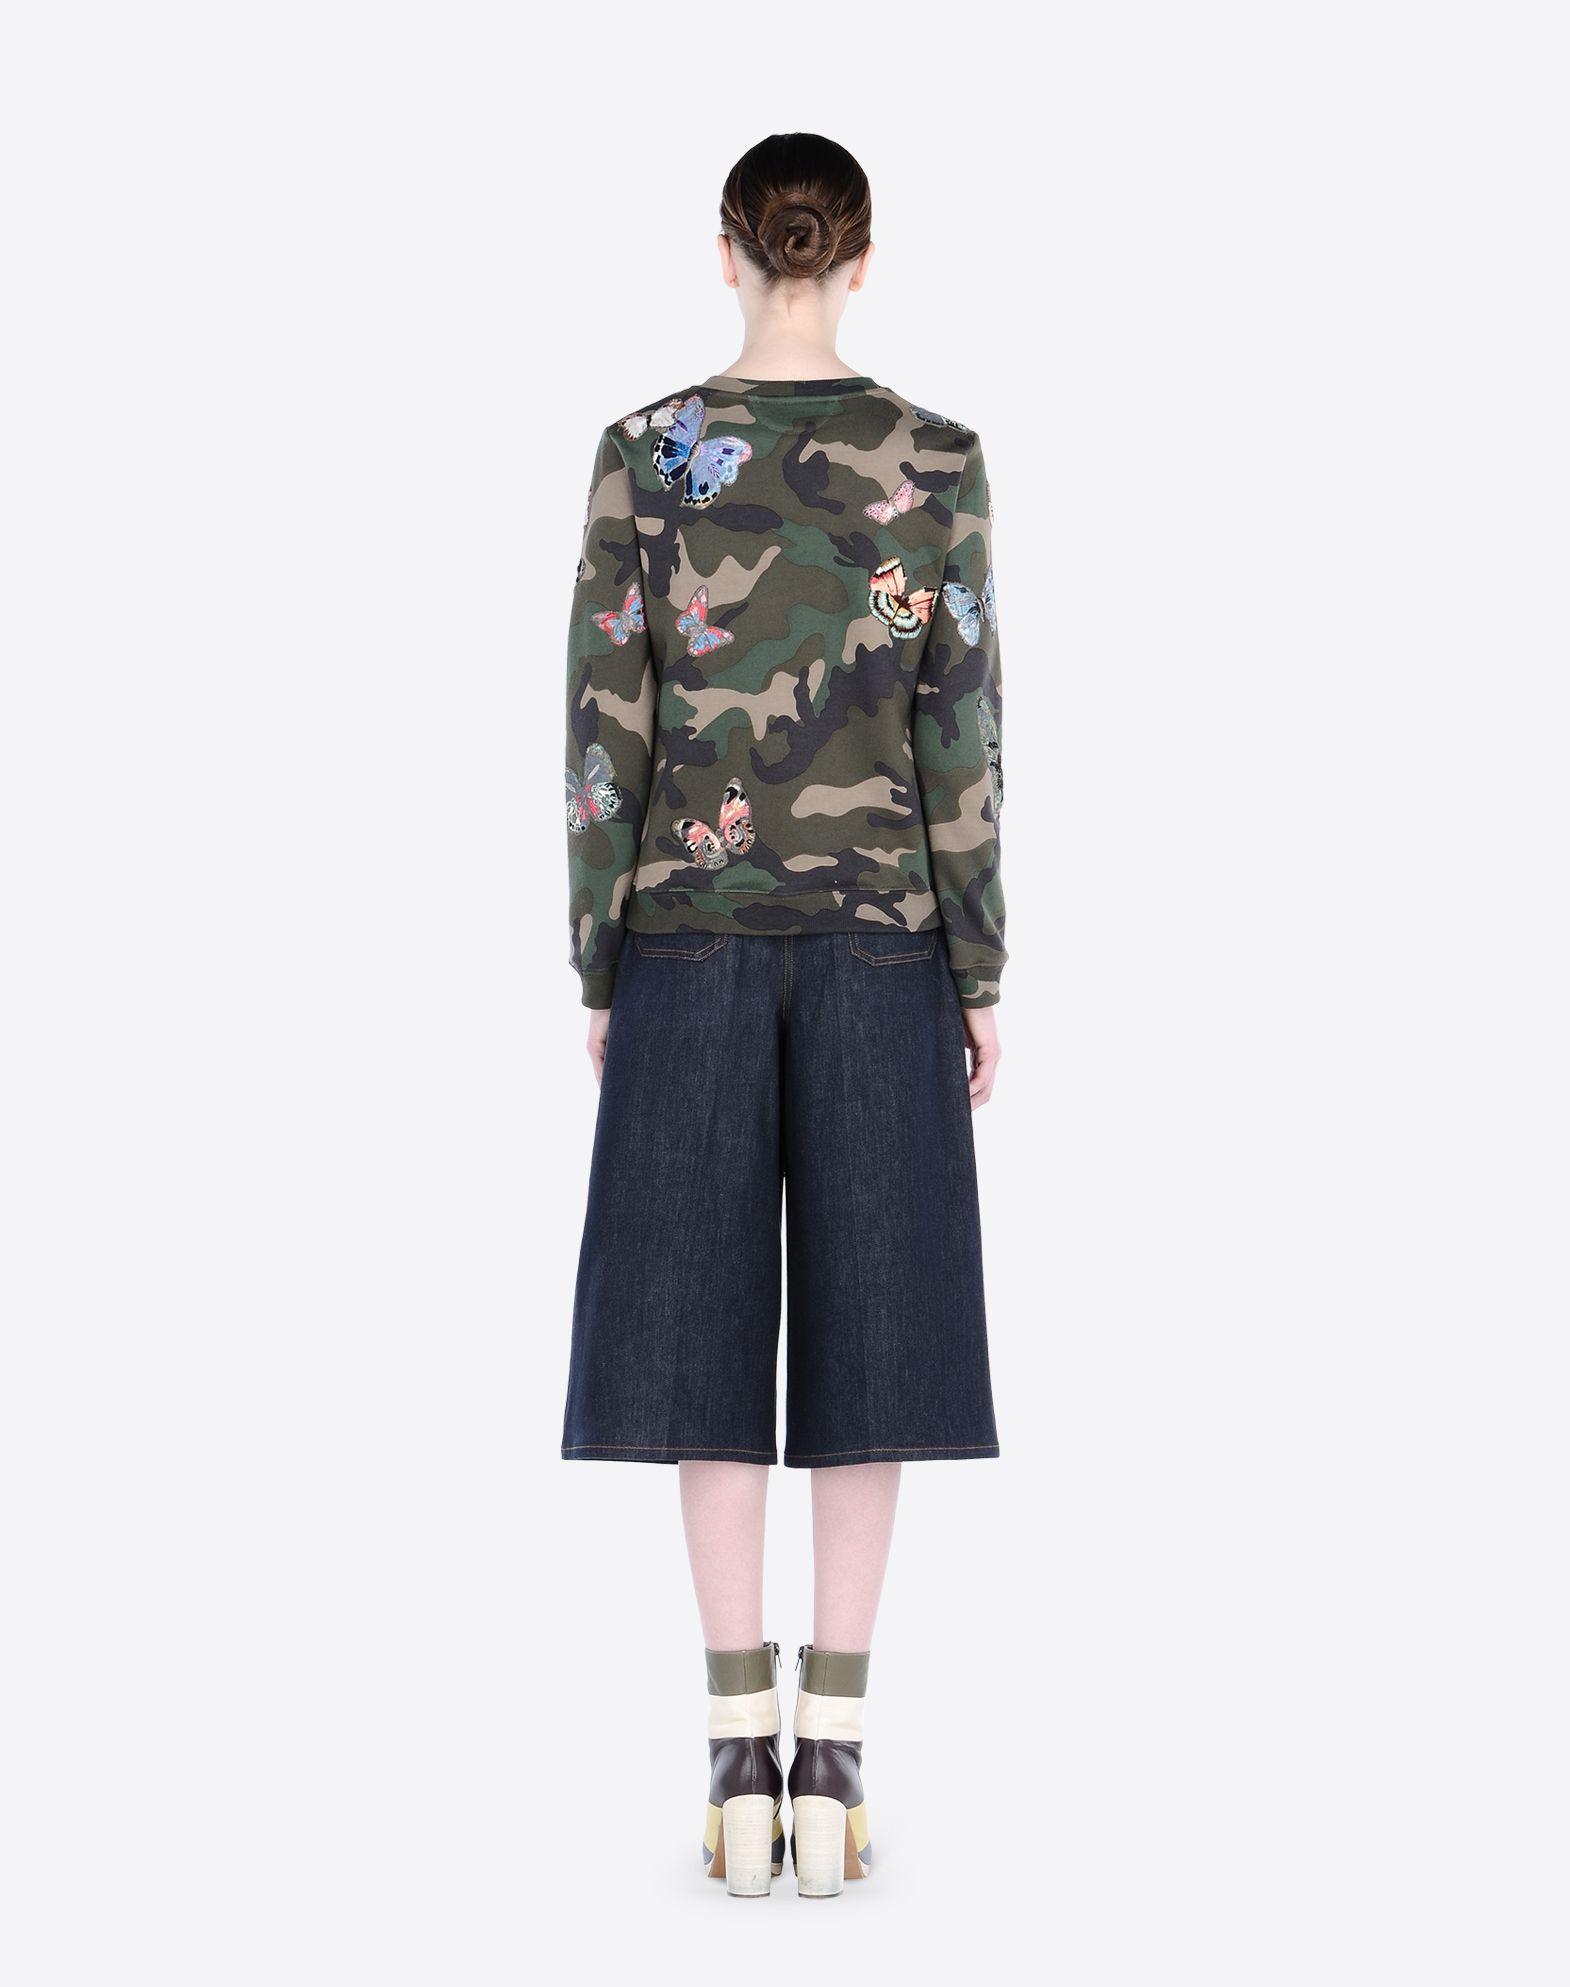 VALENTINO JB3MF00N23Y 825 Knitwear, shirts and tops D a